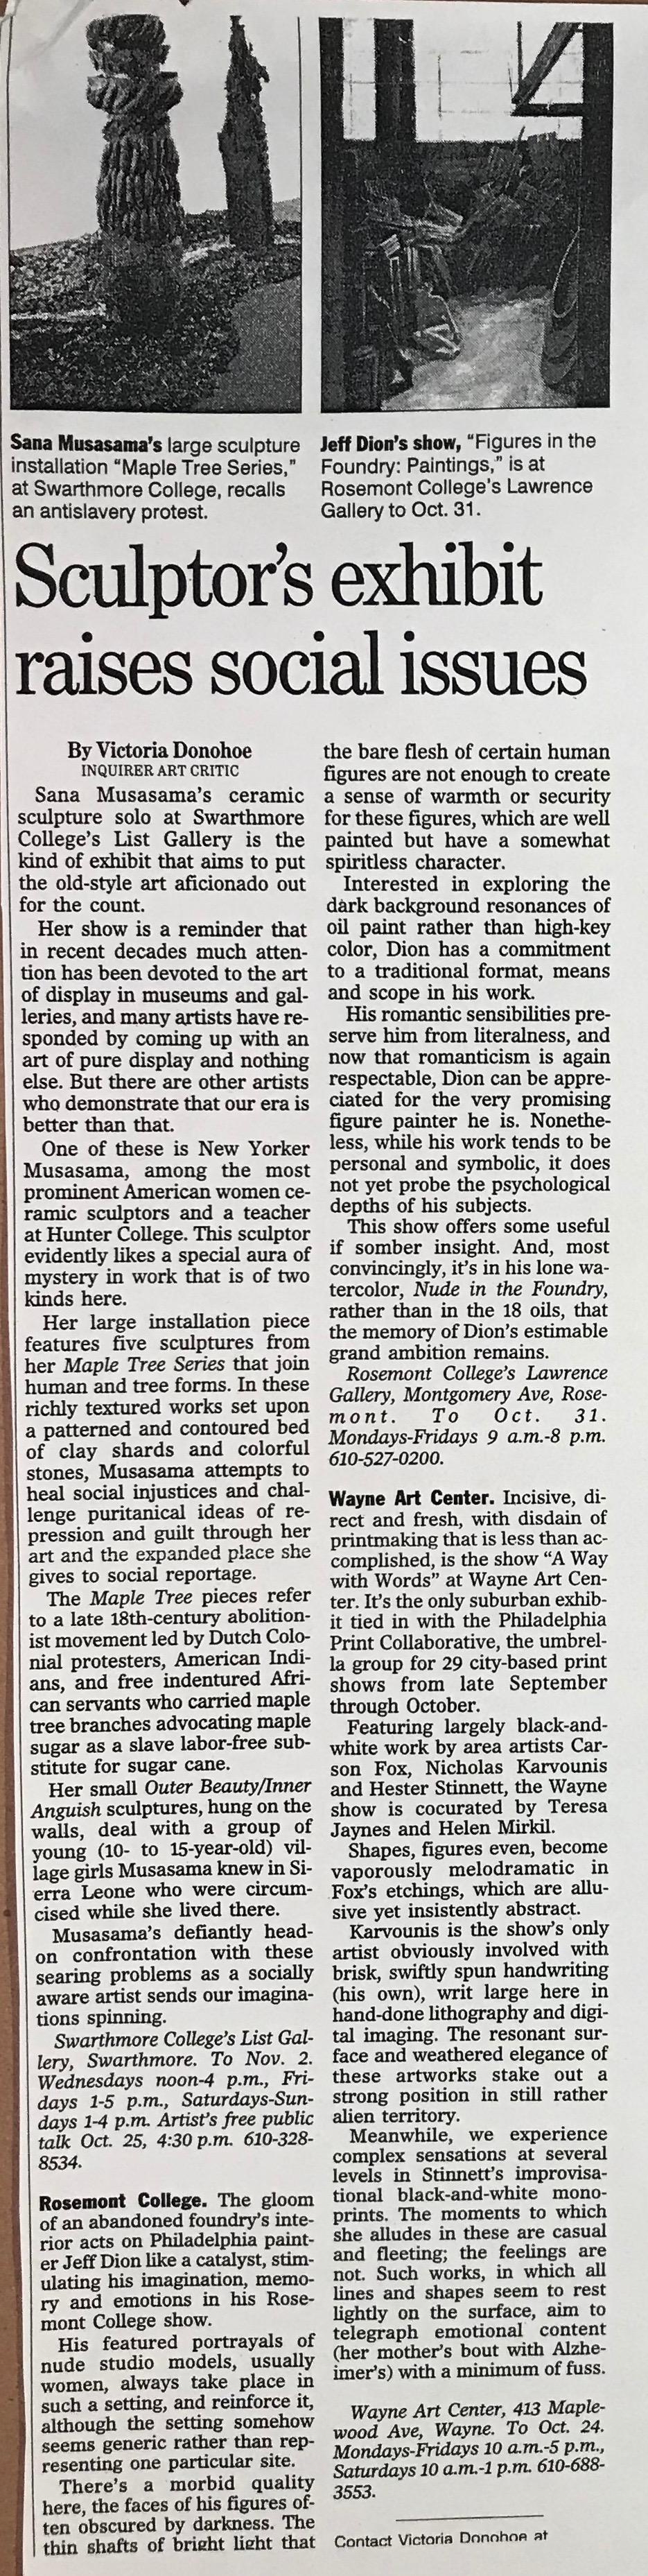 Rosemount College The Philadelphia Inquirer Victoria Donohoe 2002